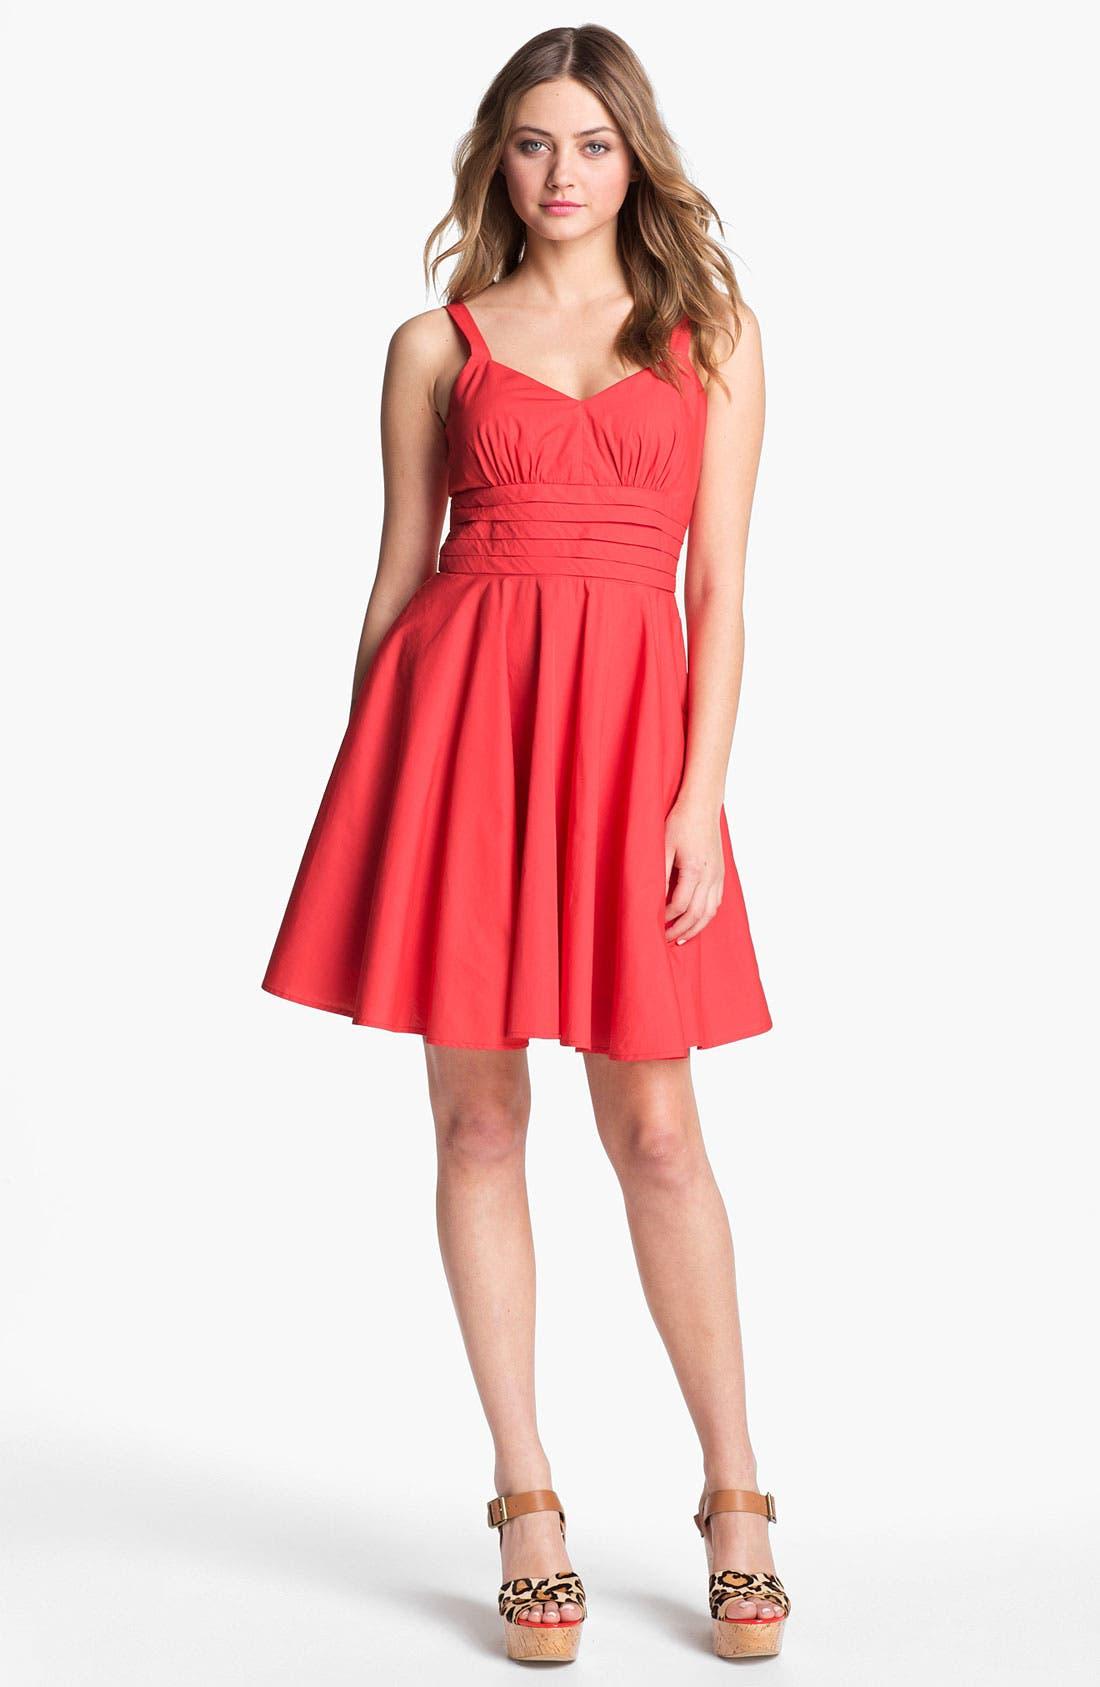 Alternate Image 1 Selected - BB Dakota 'Maida' Cotton Fit & Flare Dress